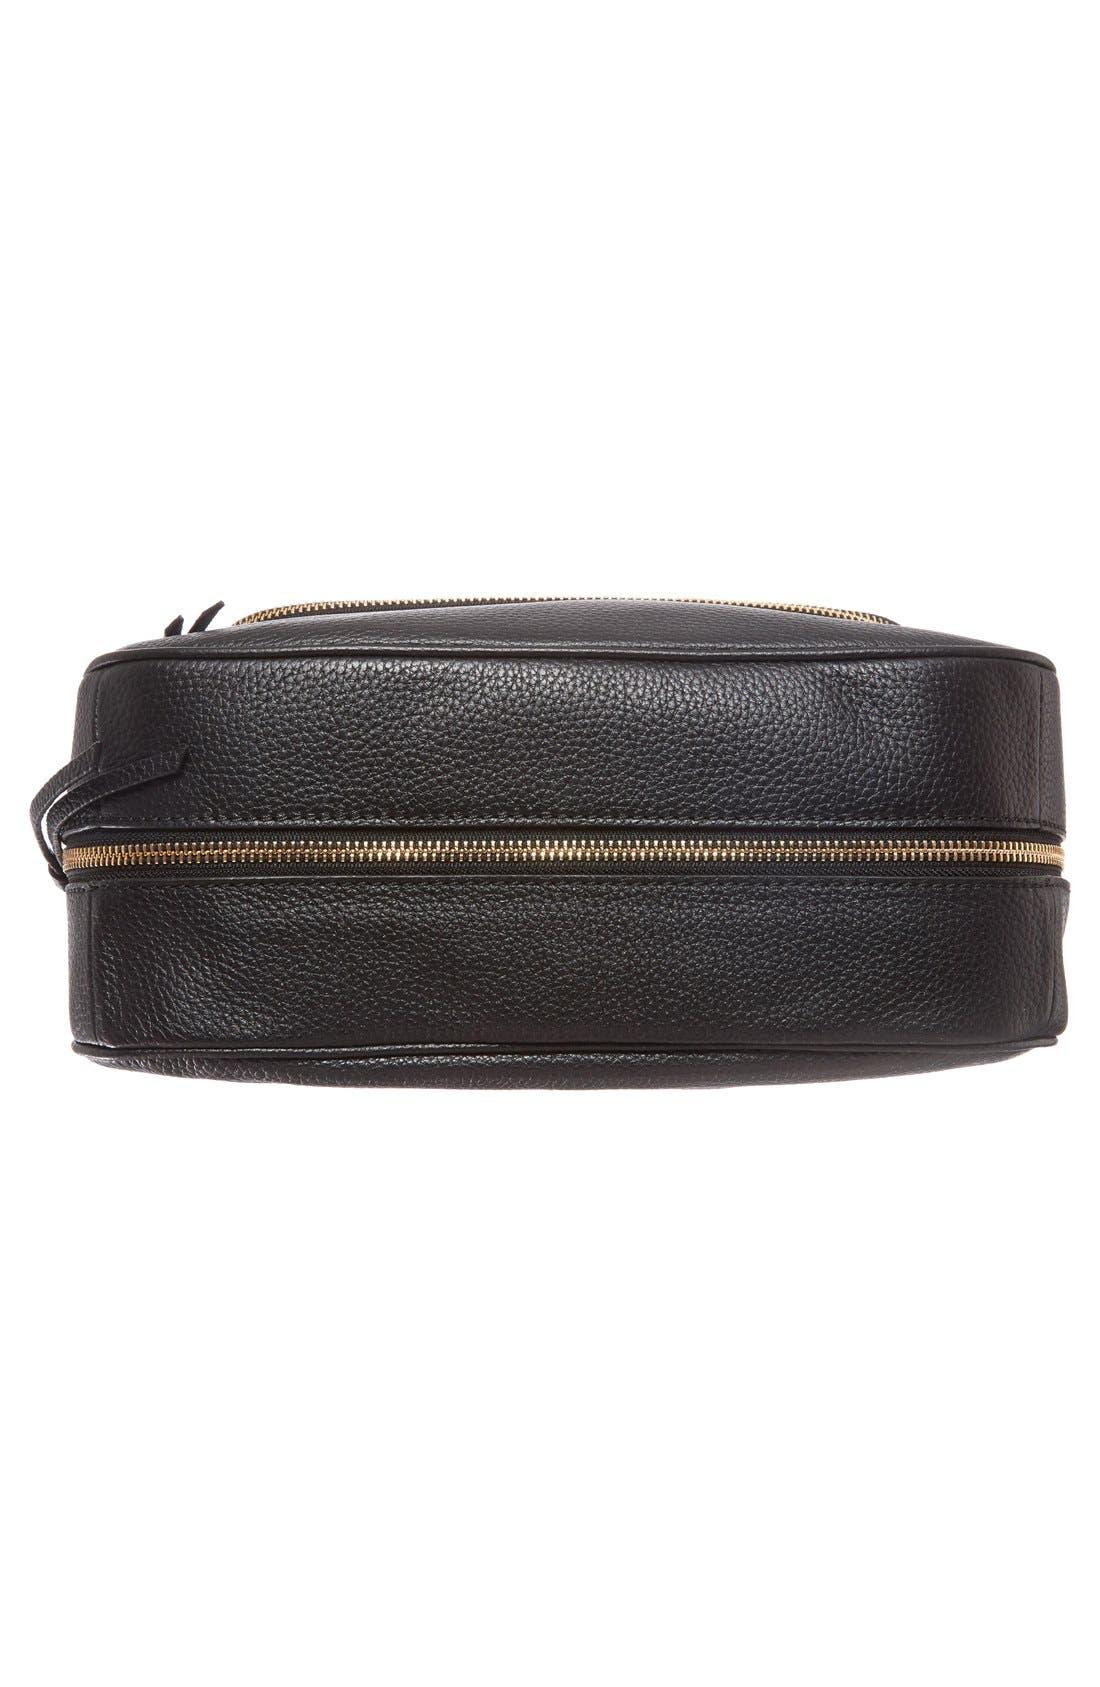 cobble hill - deva leather crossbody bag,                             Alternate thumbnail 6, color,                             Black